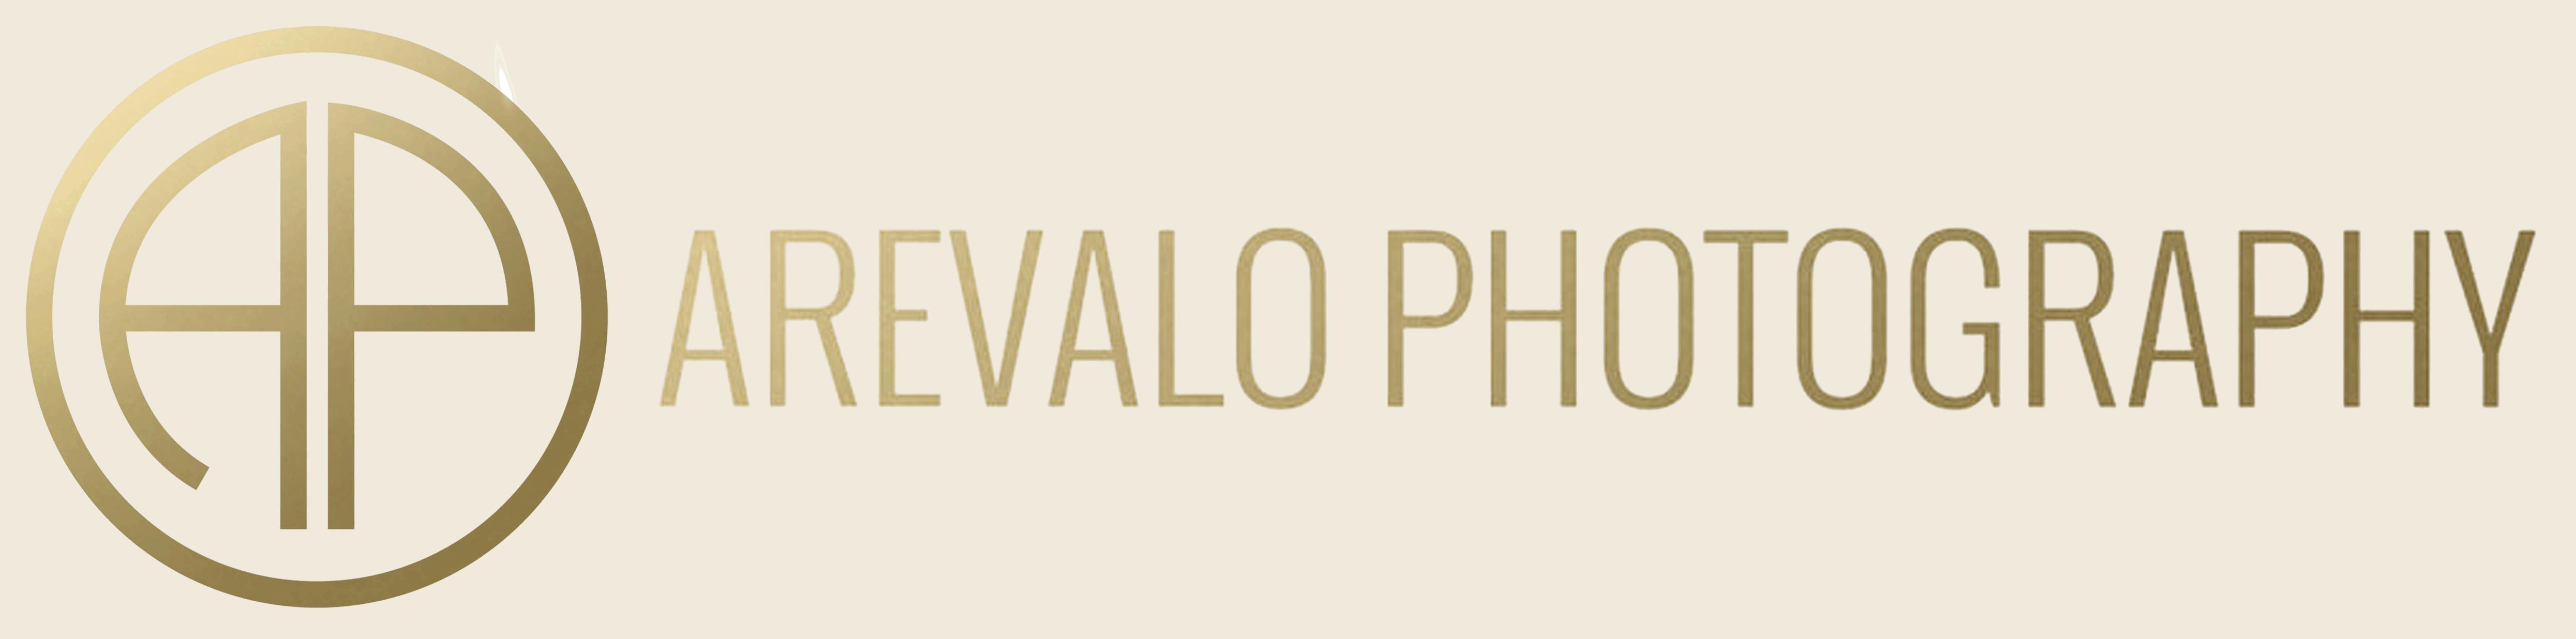 Arevalo Photography